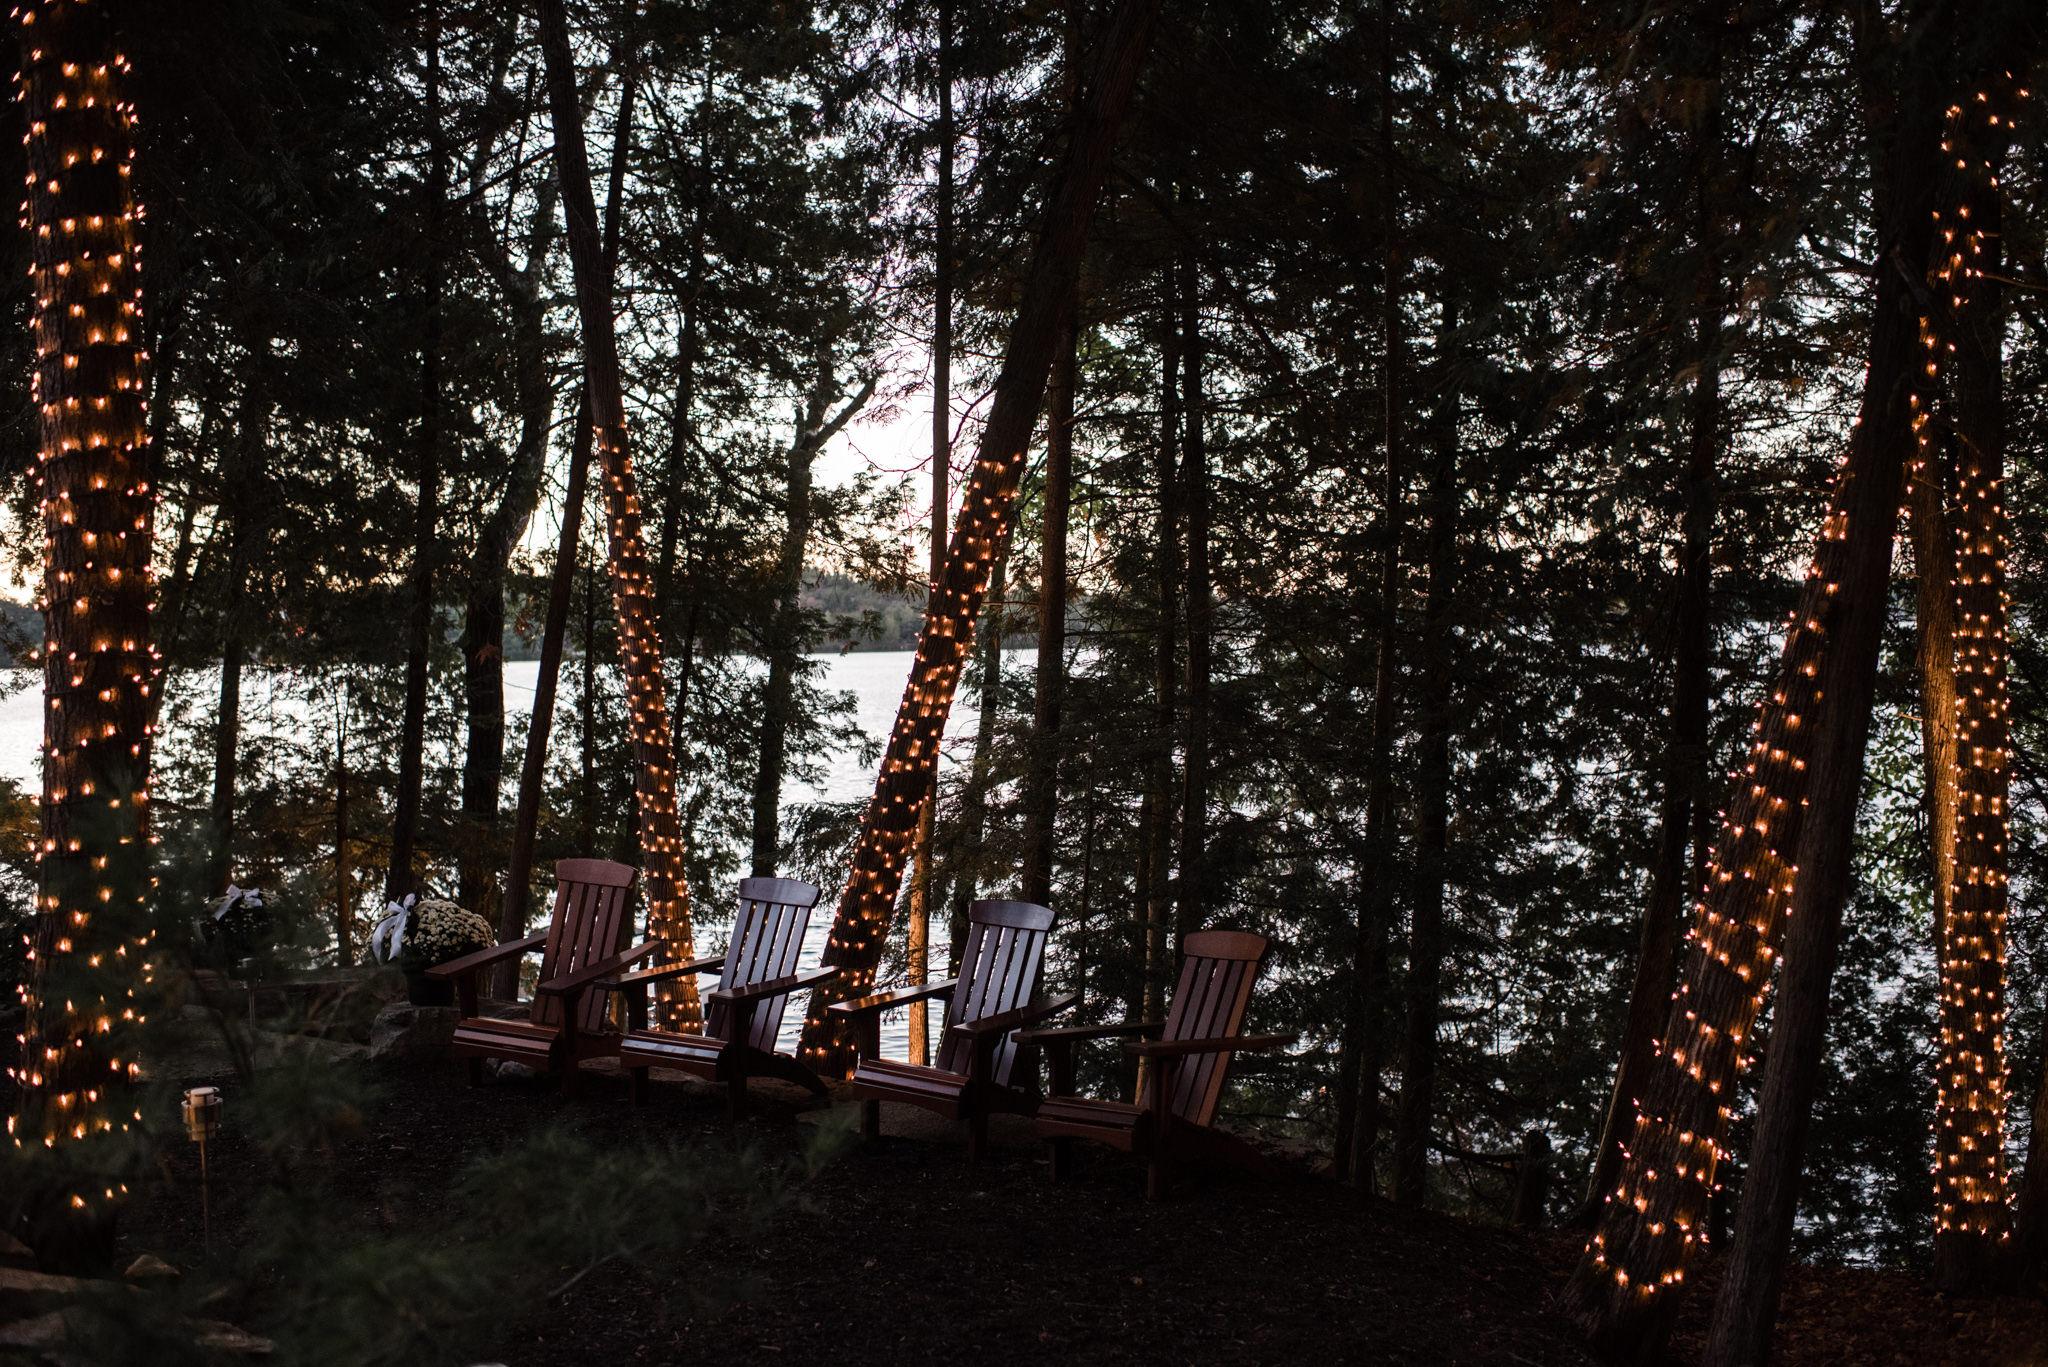 016-string-lights-romantic-wedding-photography-toronto-ontario.jpg